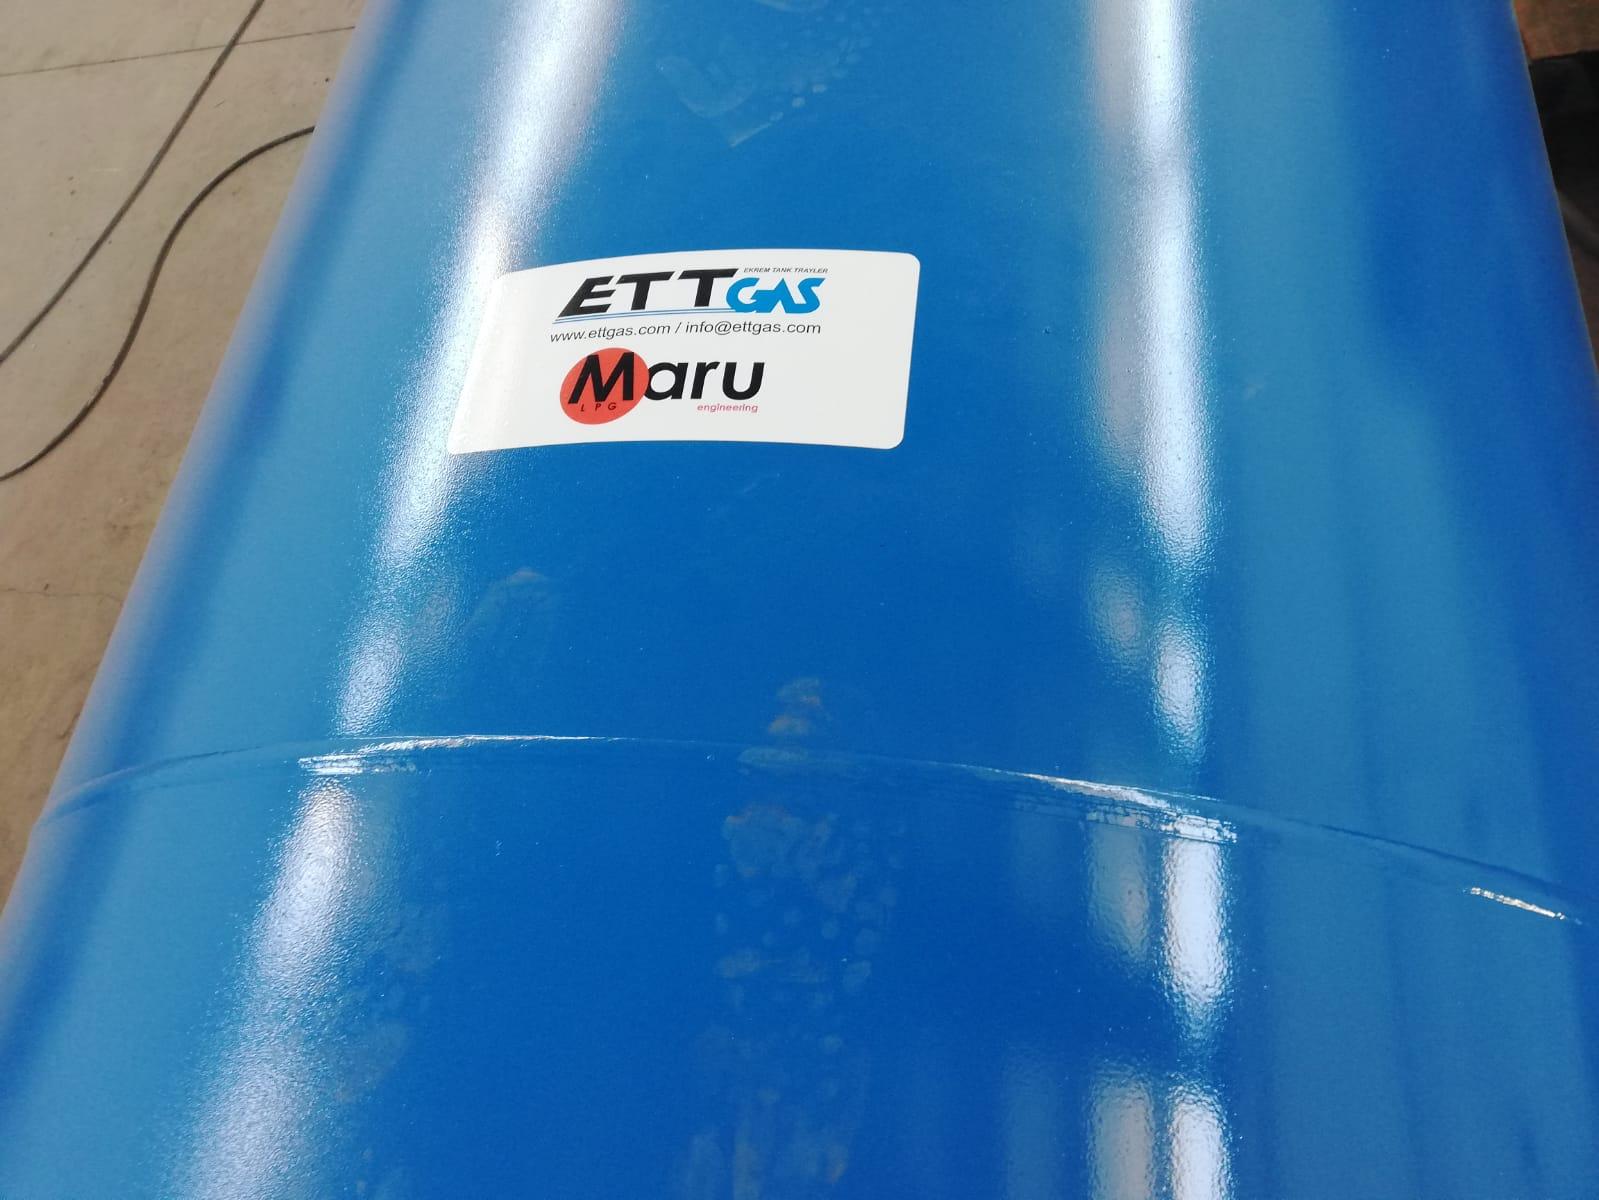 10 m3 AIR TANK 34 BAR TEST PRESSURE WE SENT AFRICA